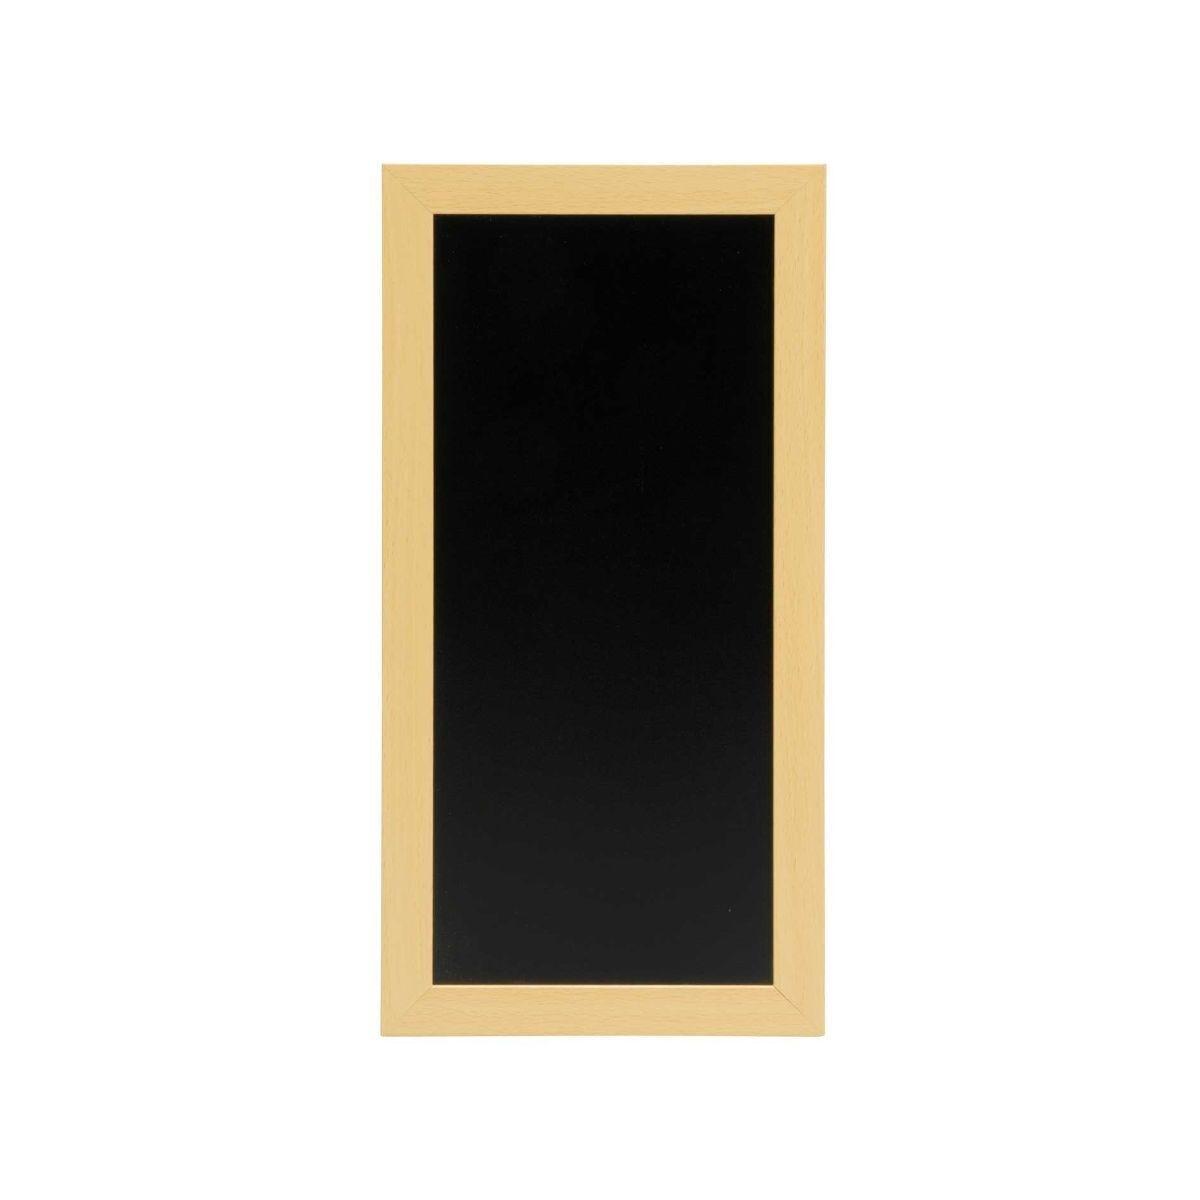 Securit Chalk Board with Black Frame - 30 x 40cm Black